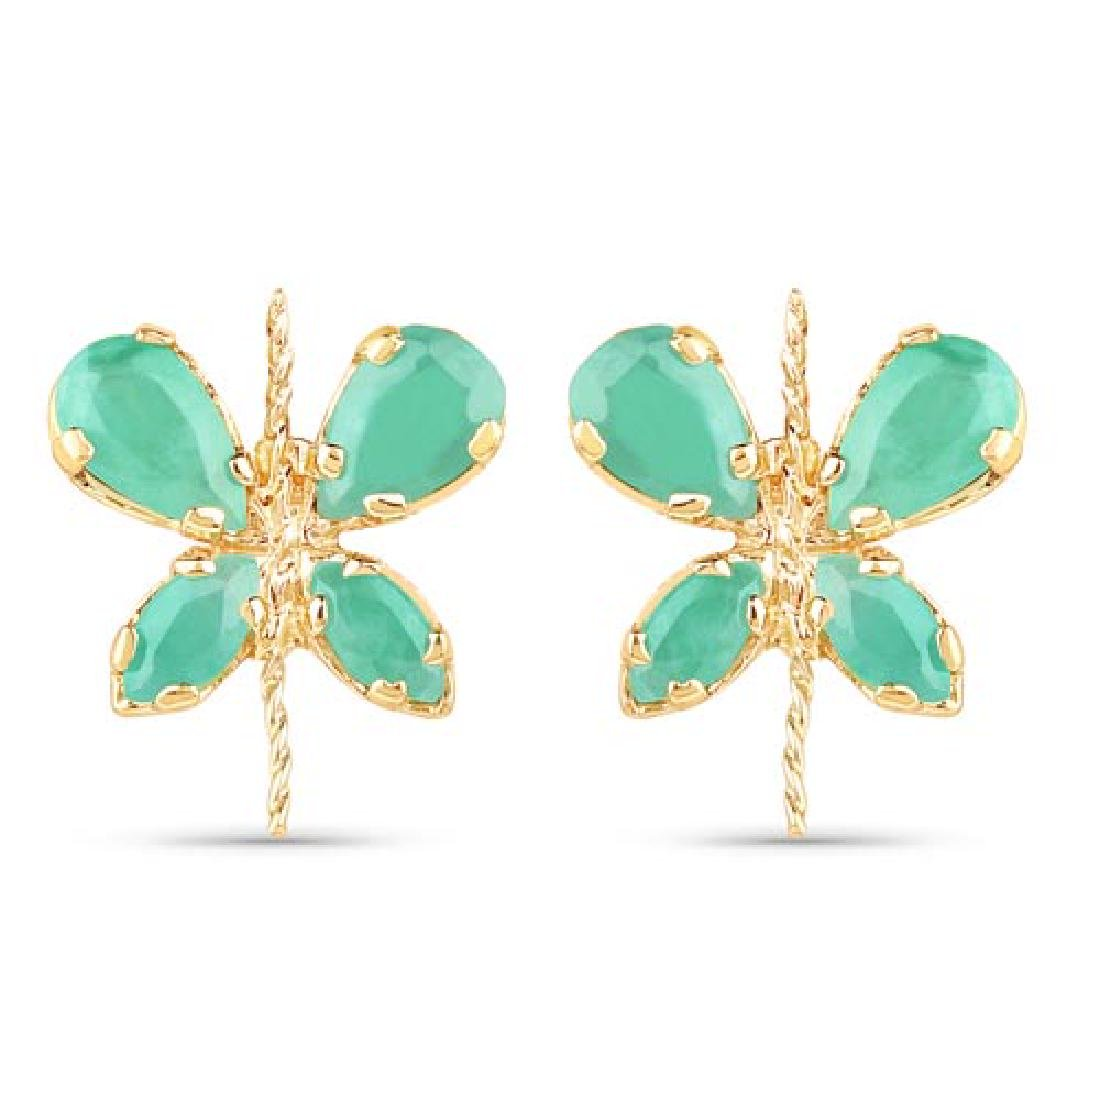 1.20 CTW Genuine Emerald 14K Yellow Gold Earrings